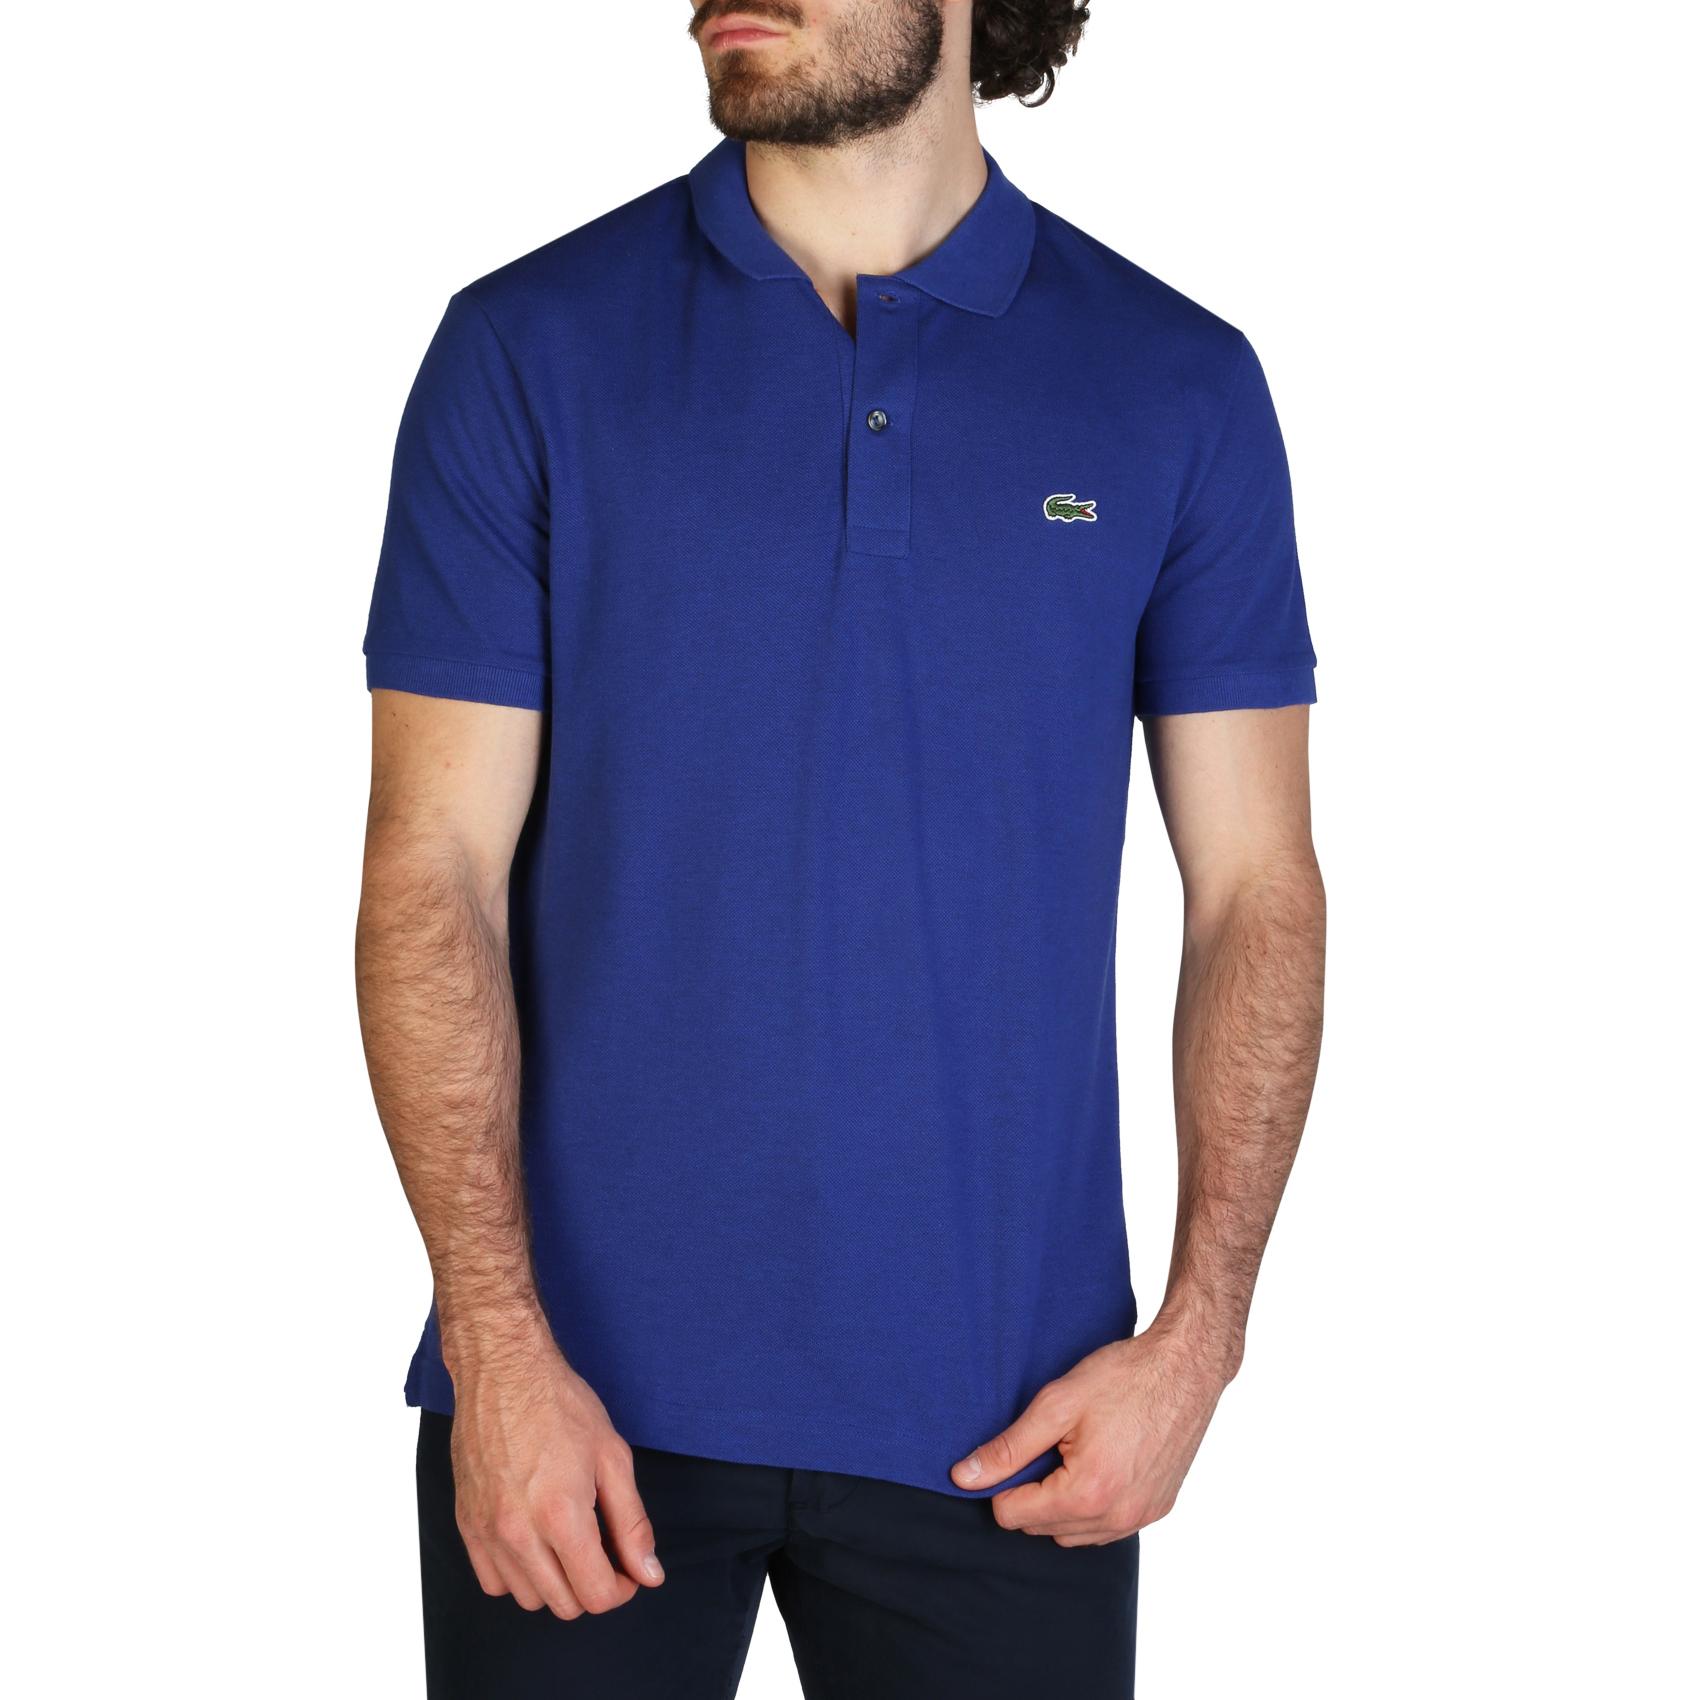 Lacoste - PH4012_SLIM - Blue